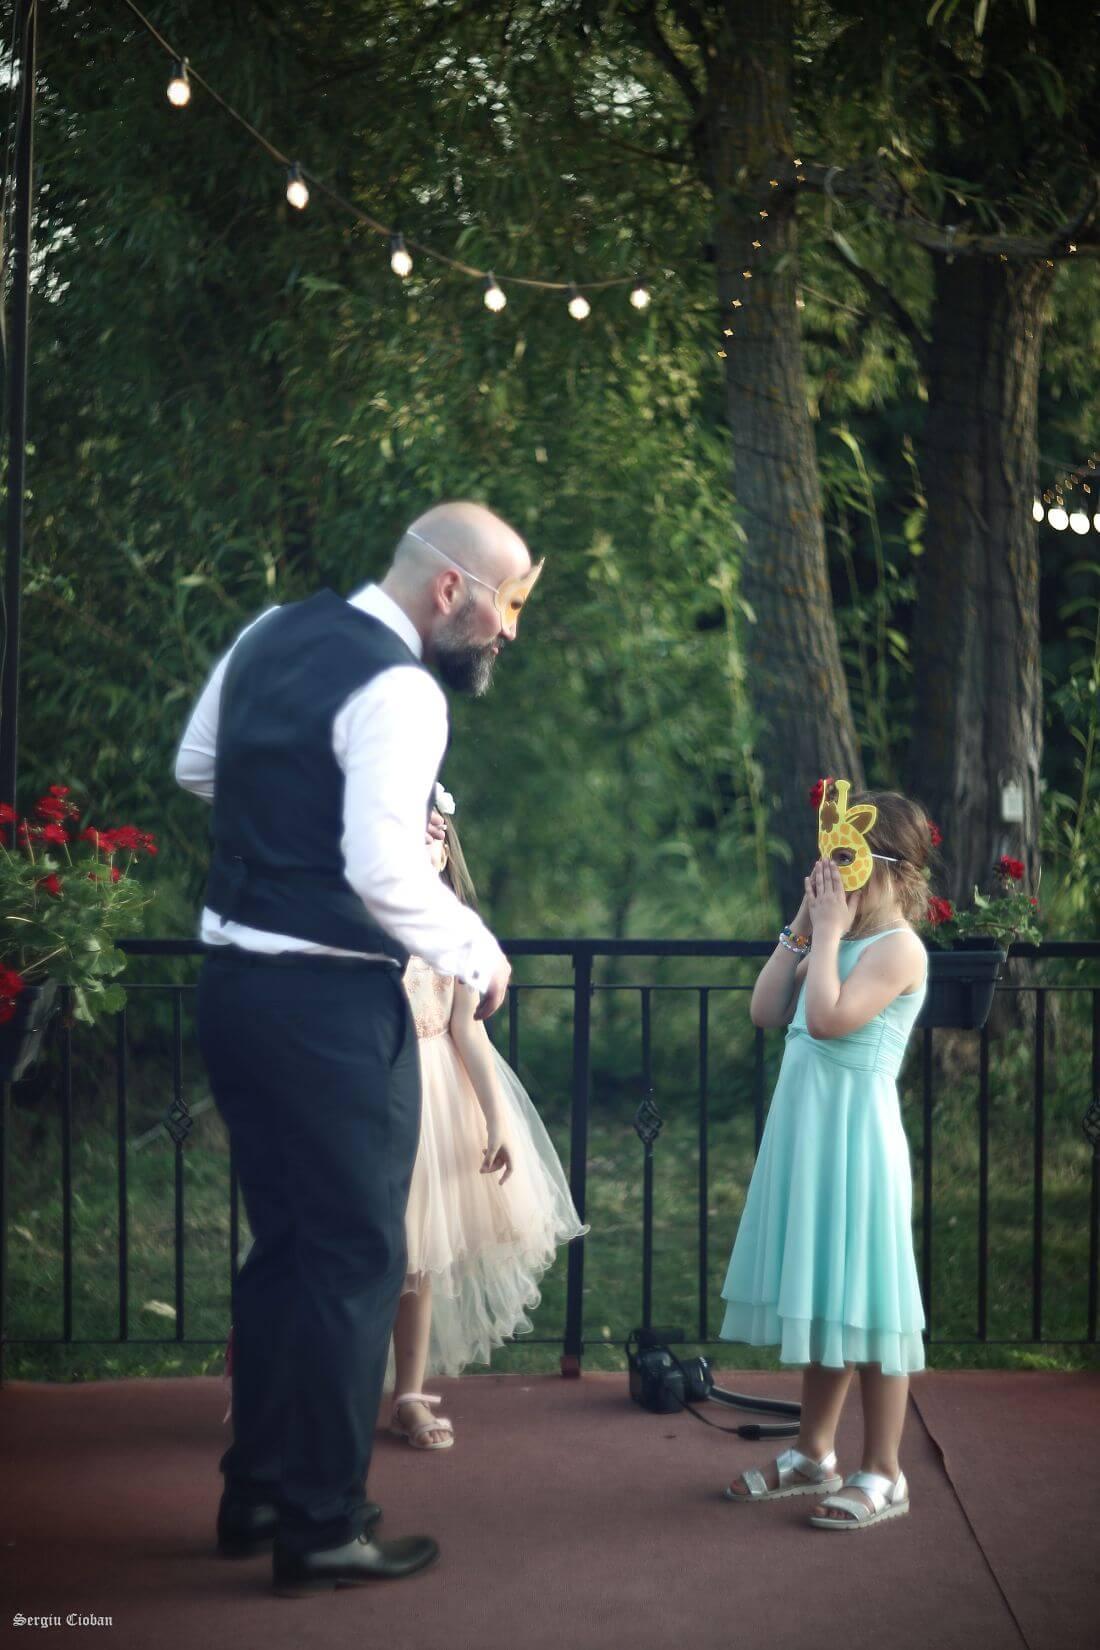 Iulia & Ludovic - IV- Sergiu Cioban - IDO-Weddings-nuntiinaerliber (10)